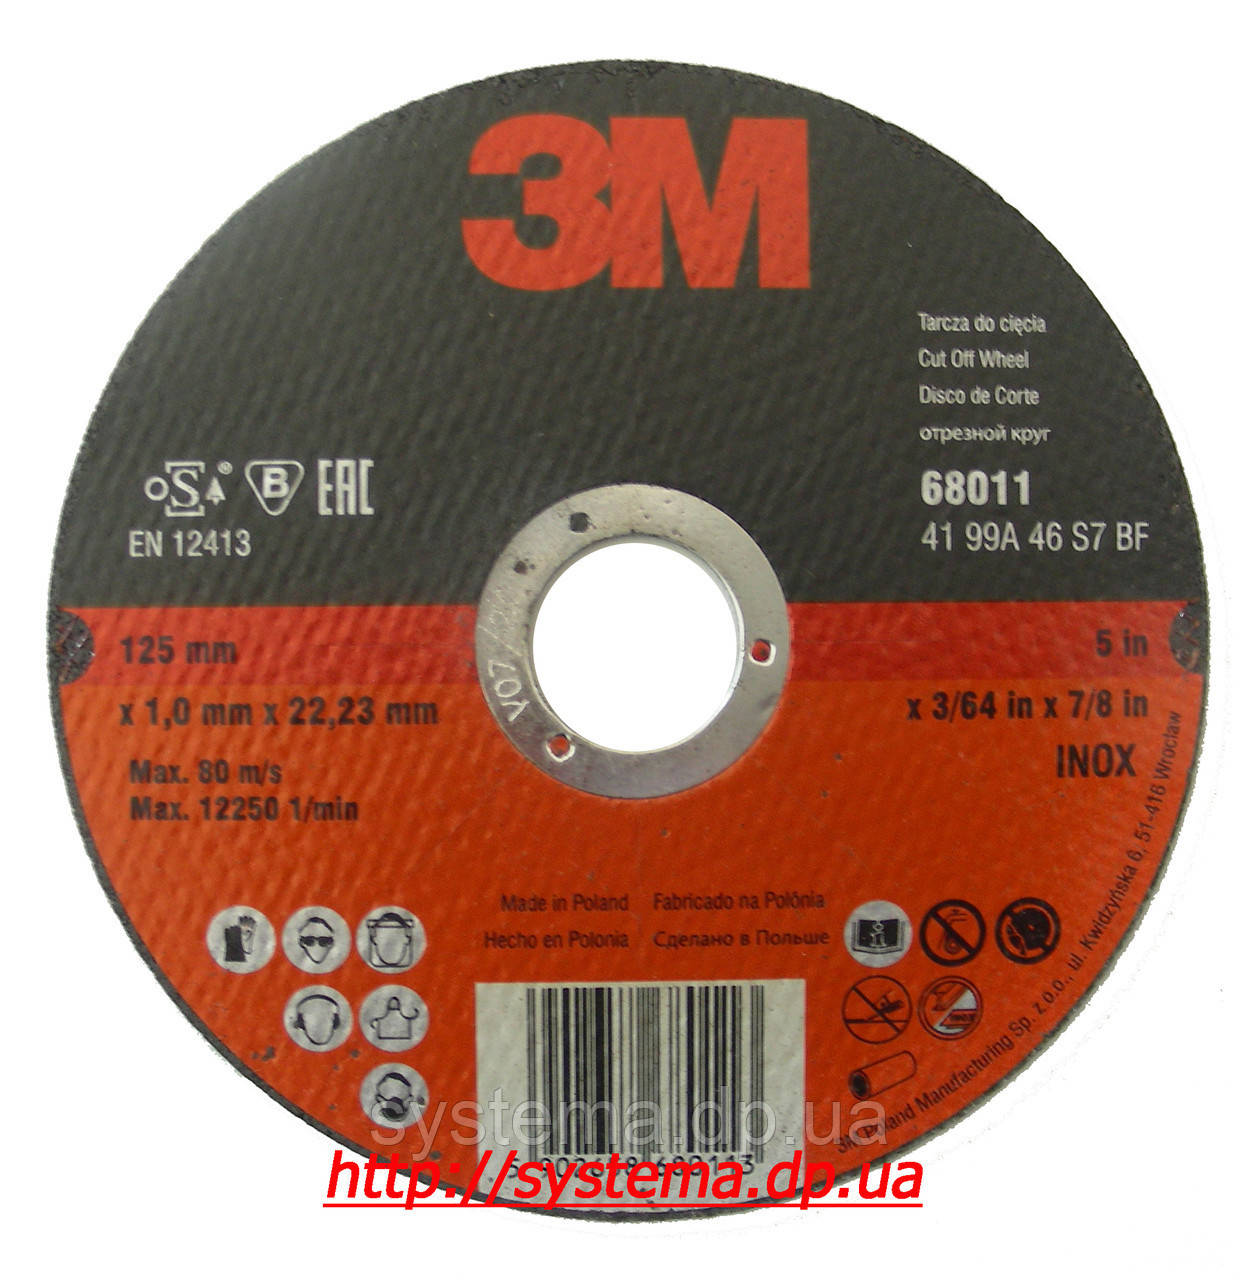 3M 62920 - Отрезной круг для нерж., прямой, INOX, 230х22,23х2,0 мм